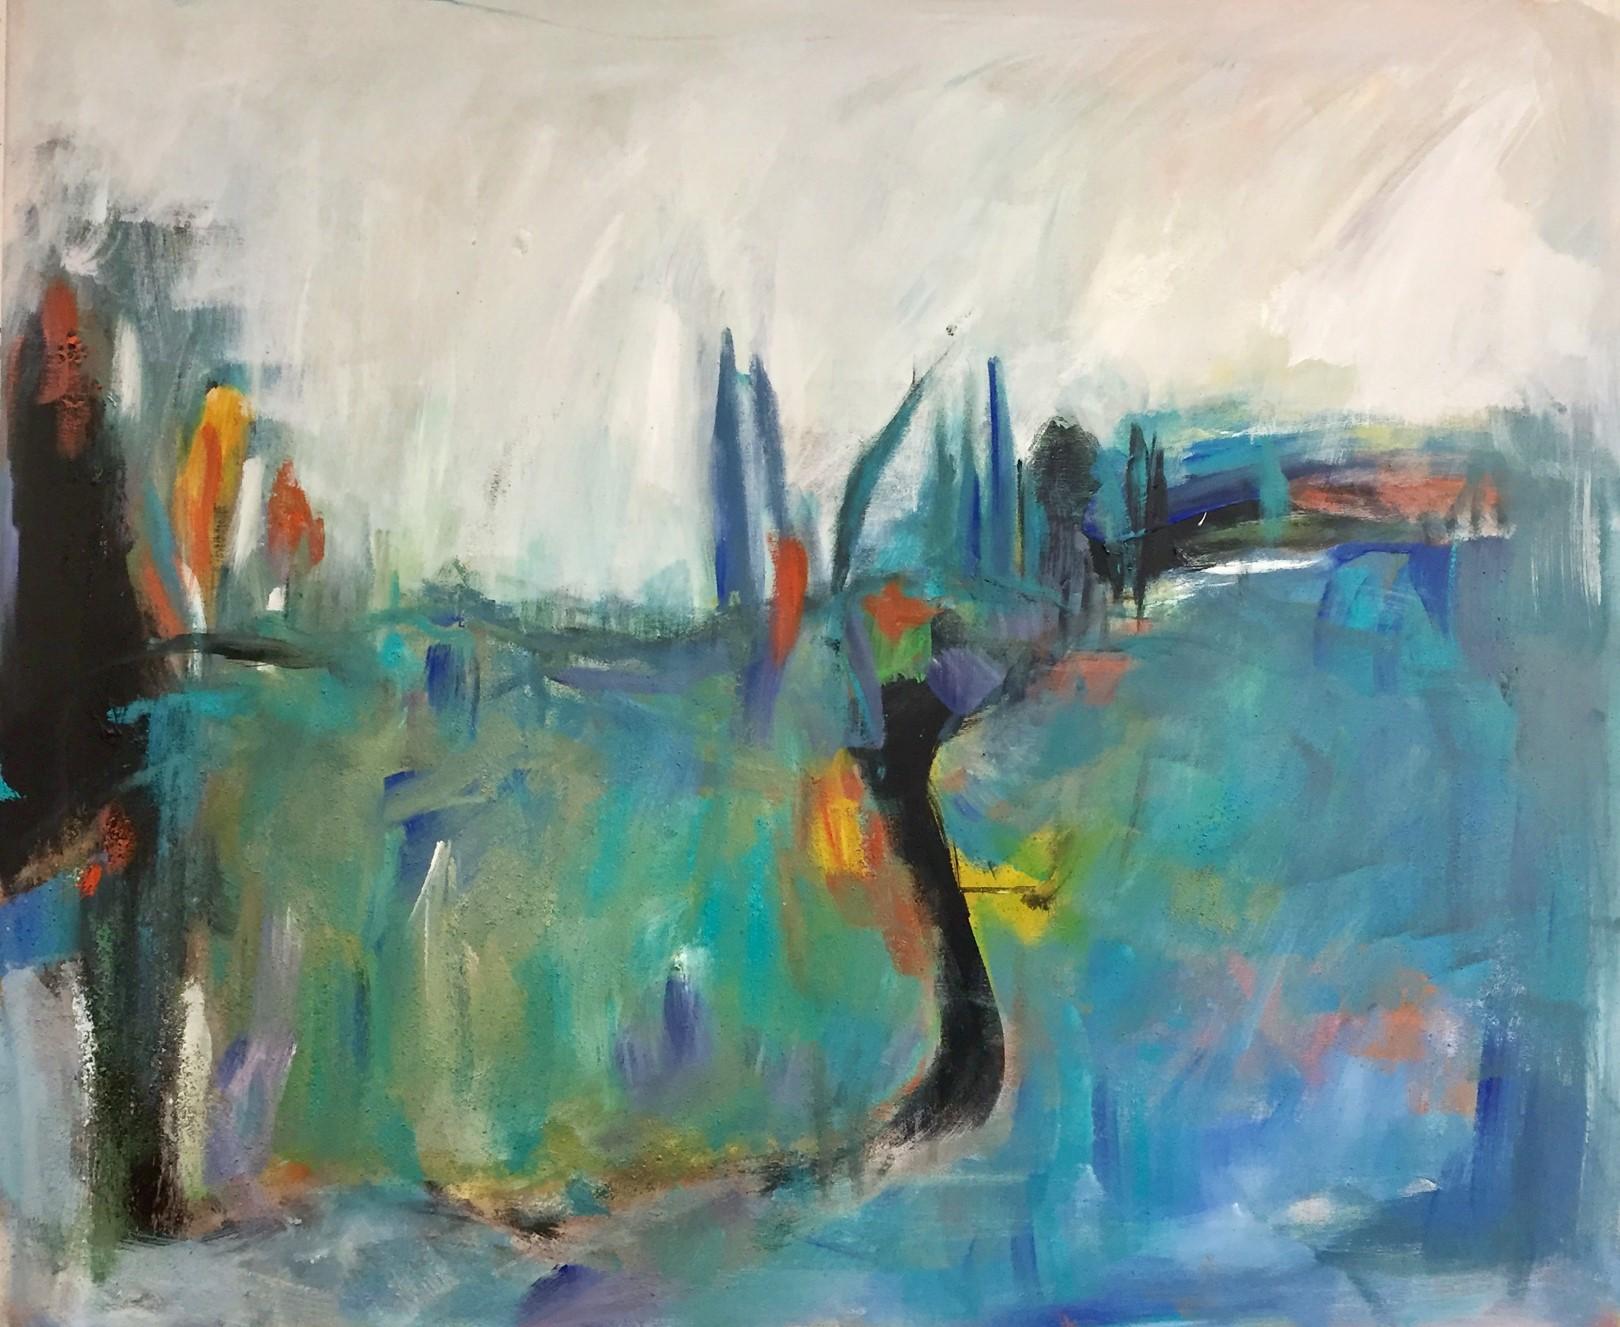 Landschaft, Acryl auf Leinwand, 120x100cm